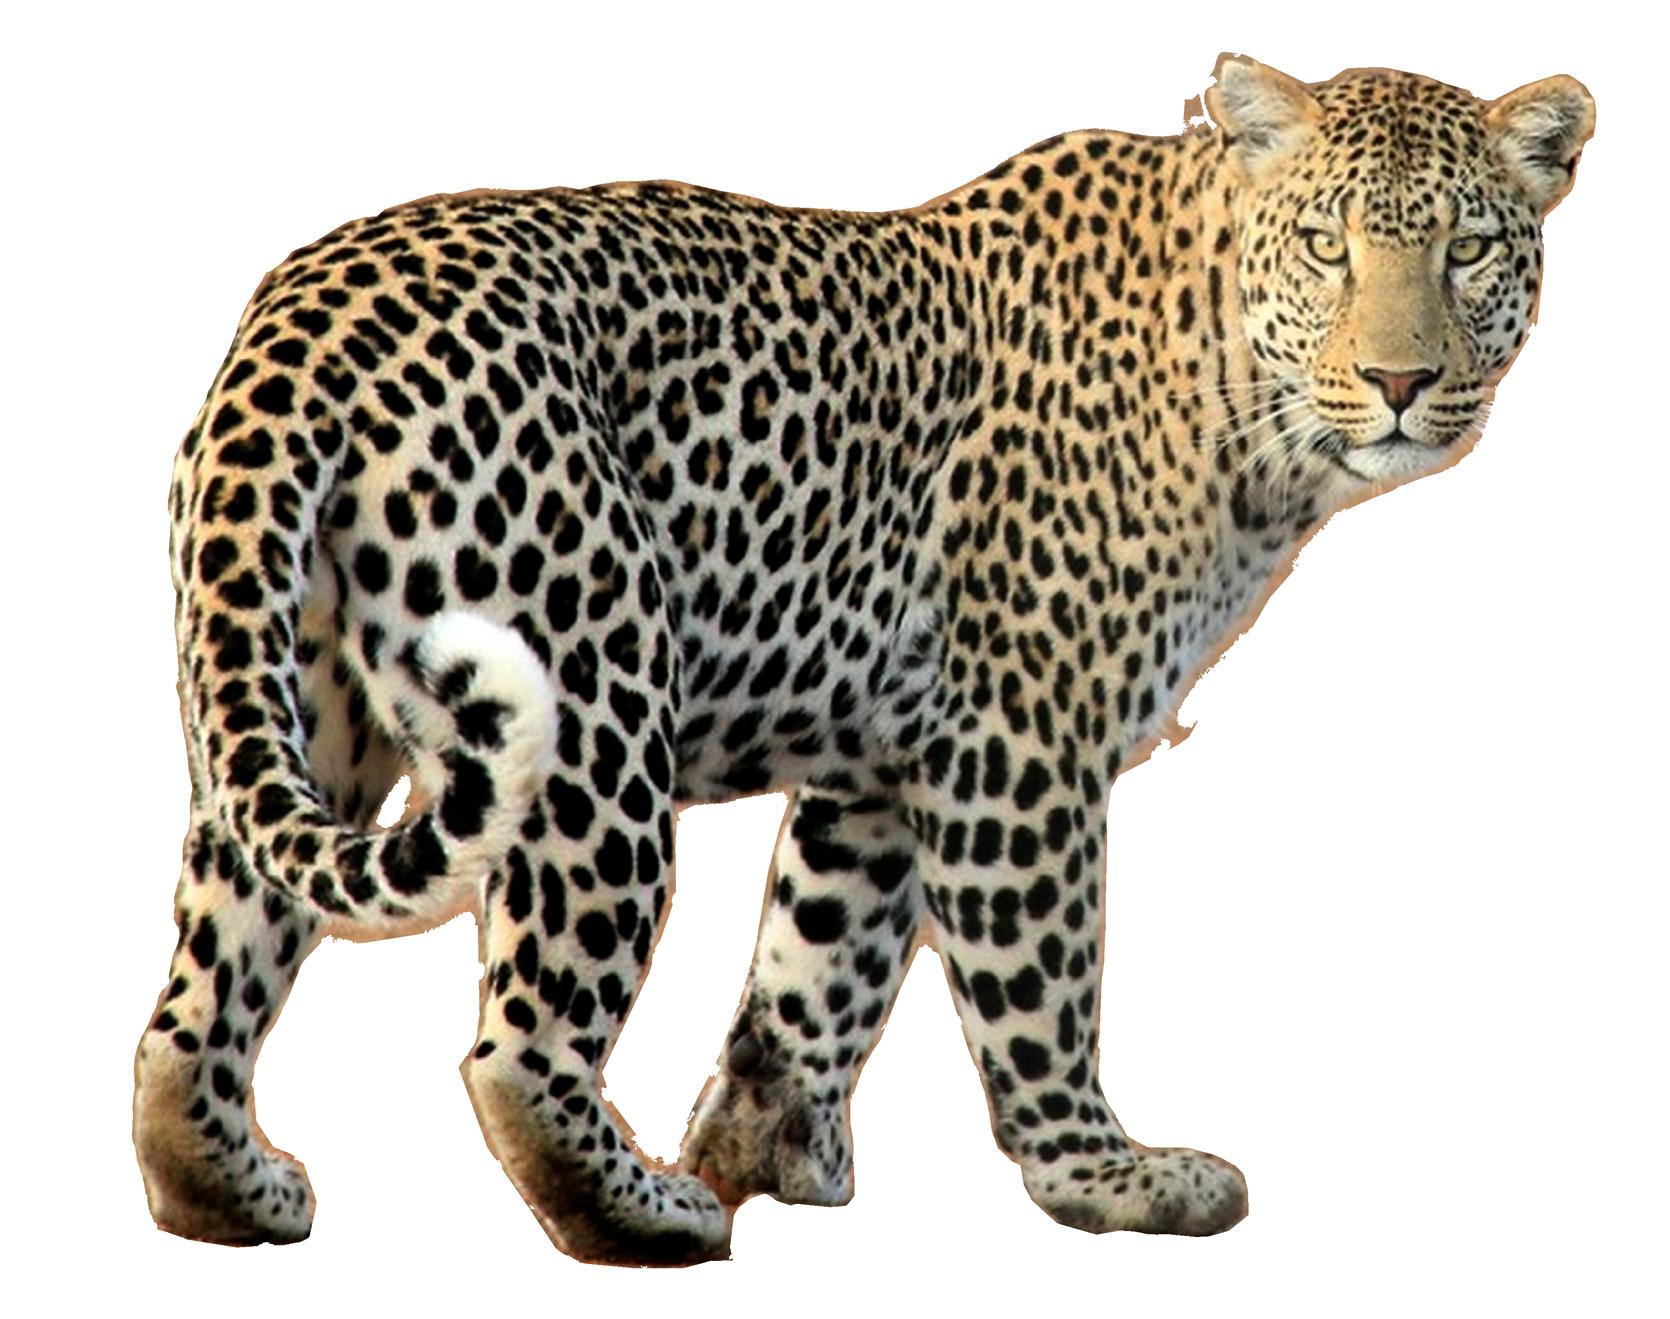 Jaguar clipart mammal animal. Leopard png image purepng